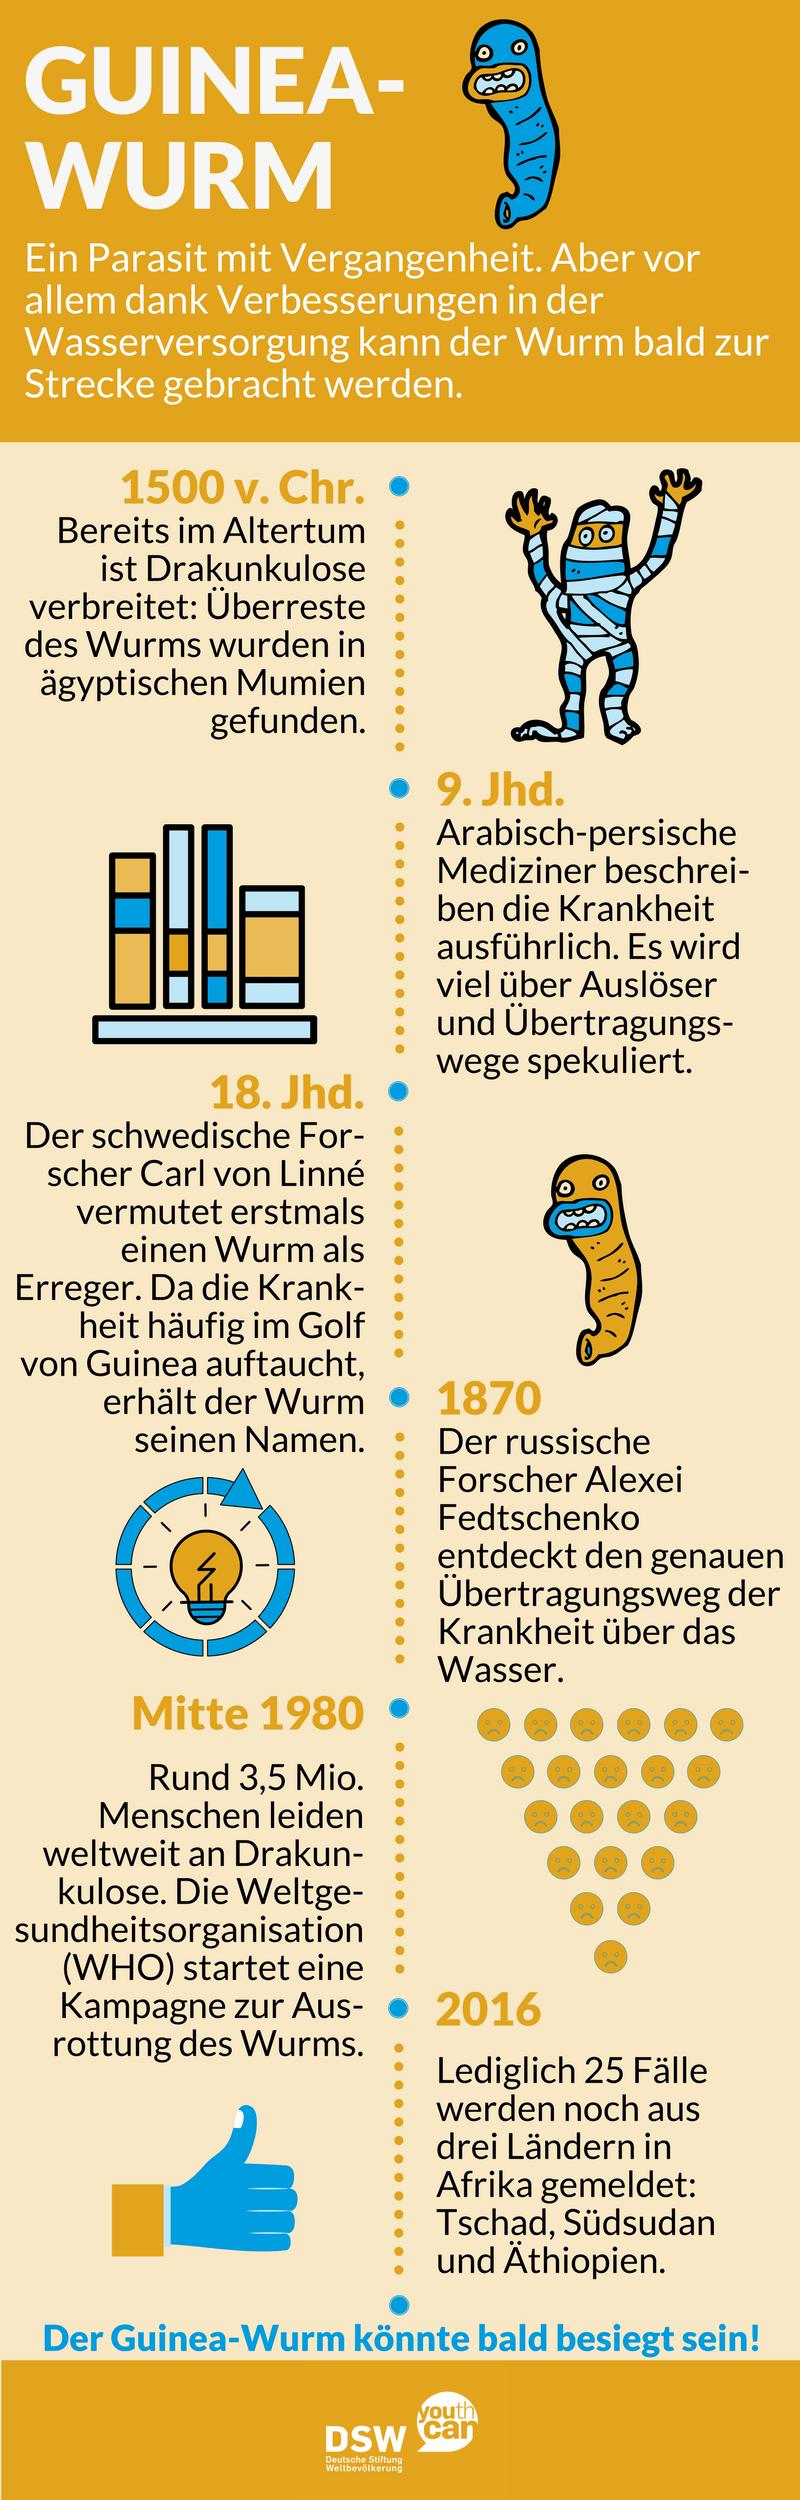 Infografik: Historie Drakunkulose/Guinea-Wurm